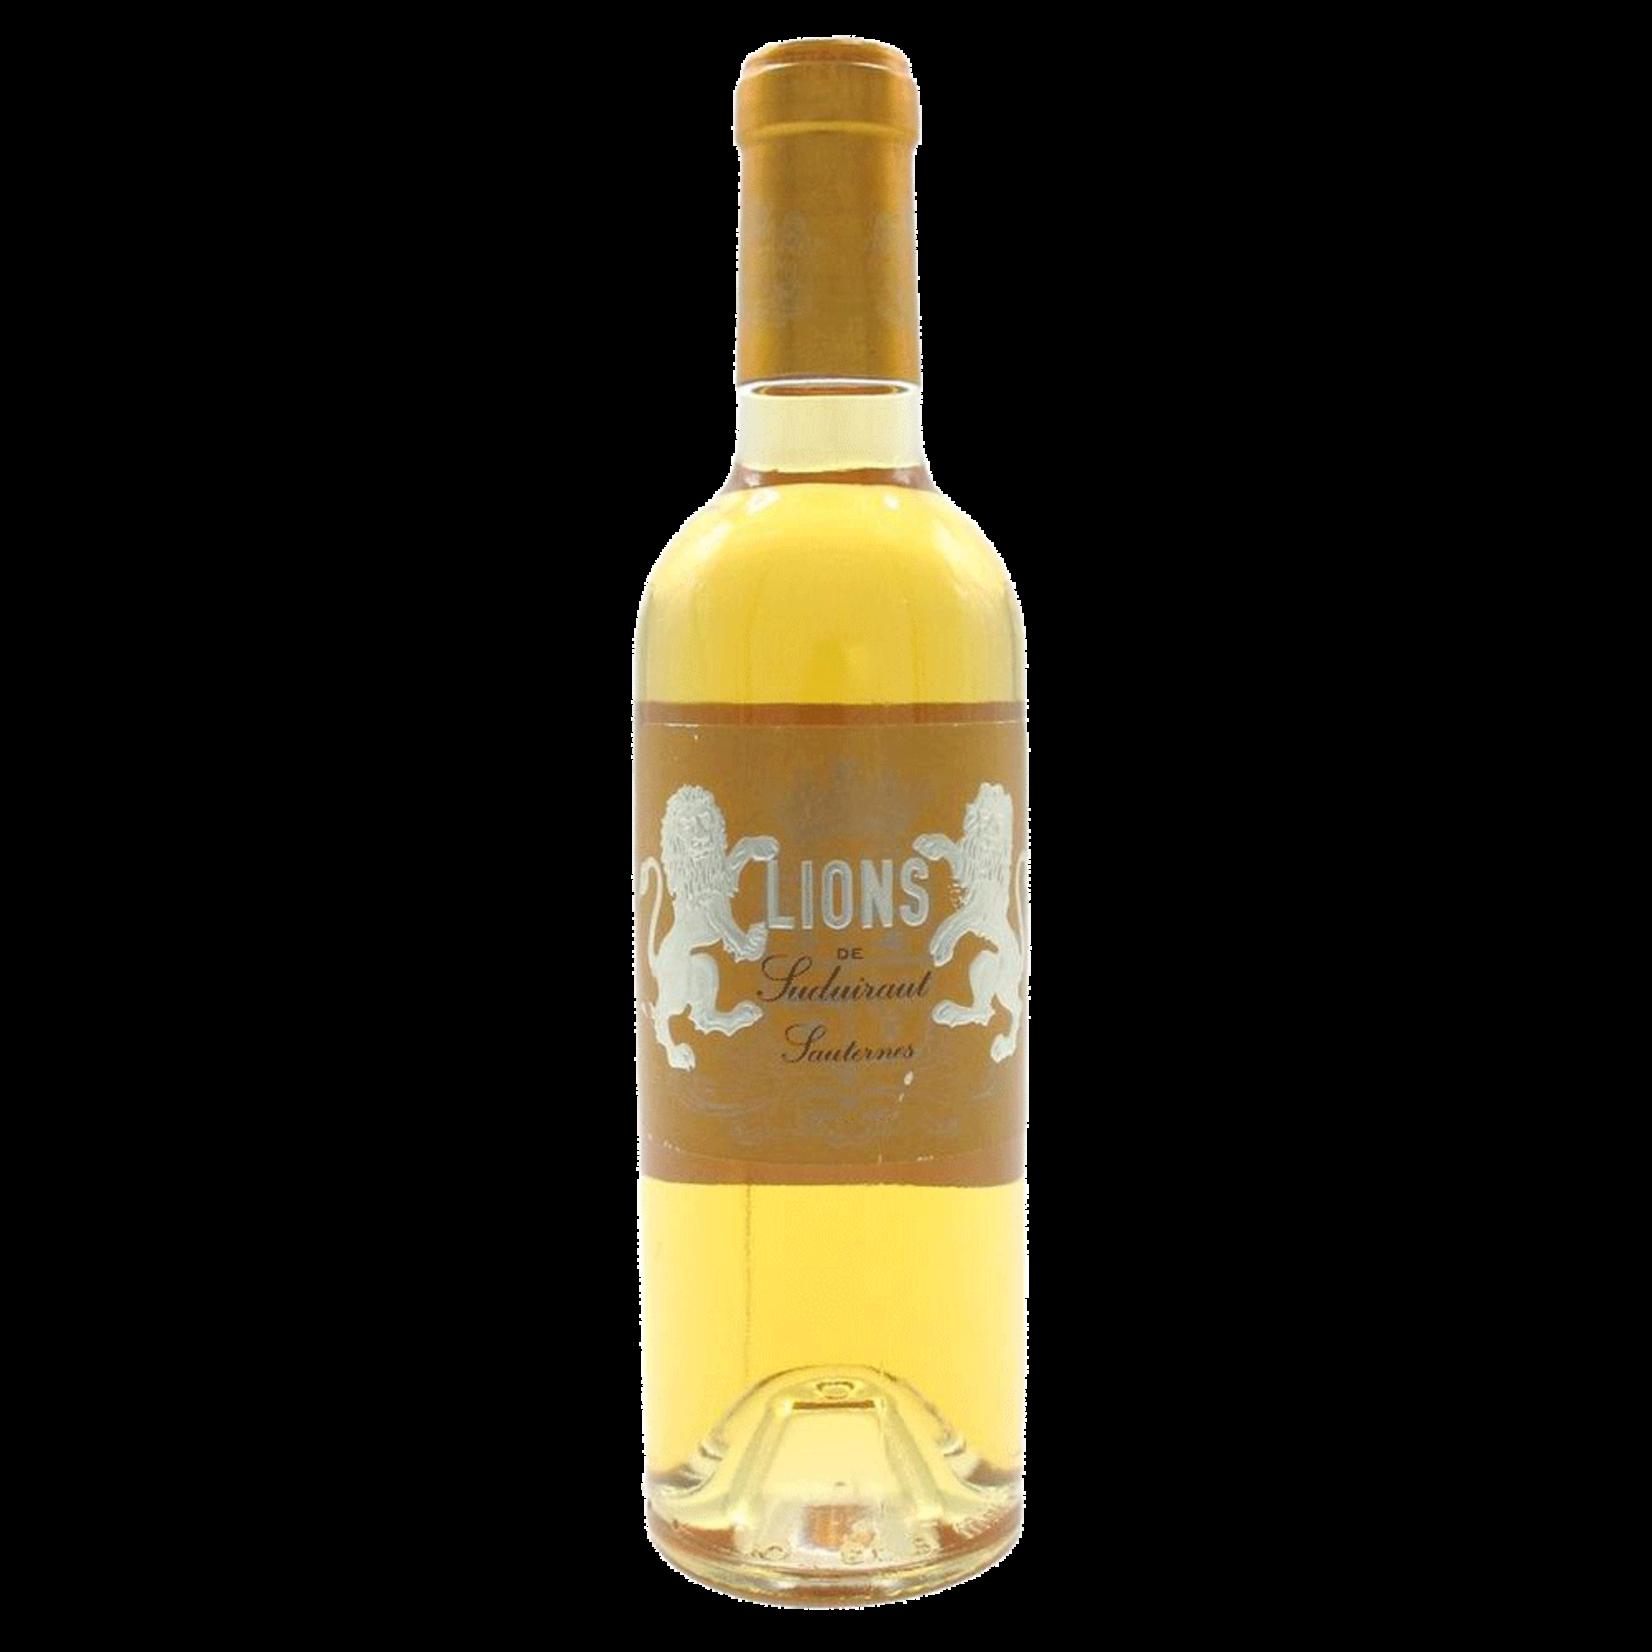 Chateau Suduiraut Sauternes Lions de Suduiraut 2016 375ml